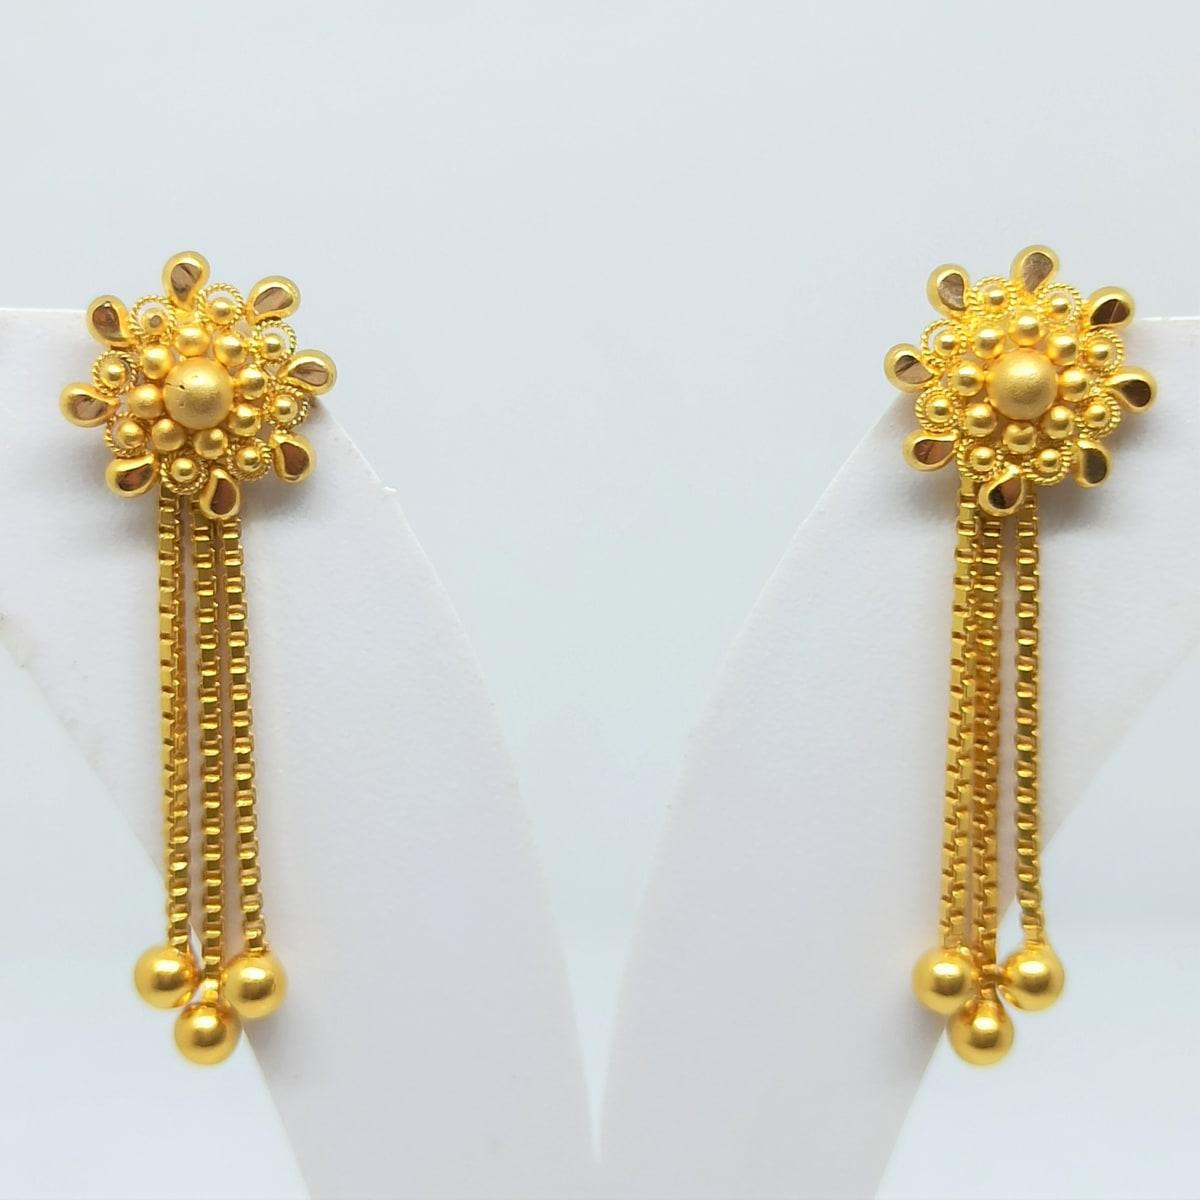 Sitara Drop Chain Earrings